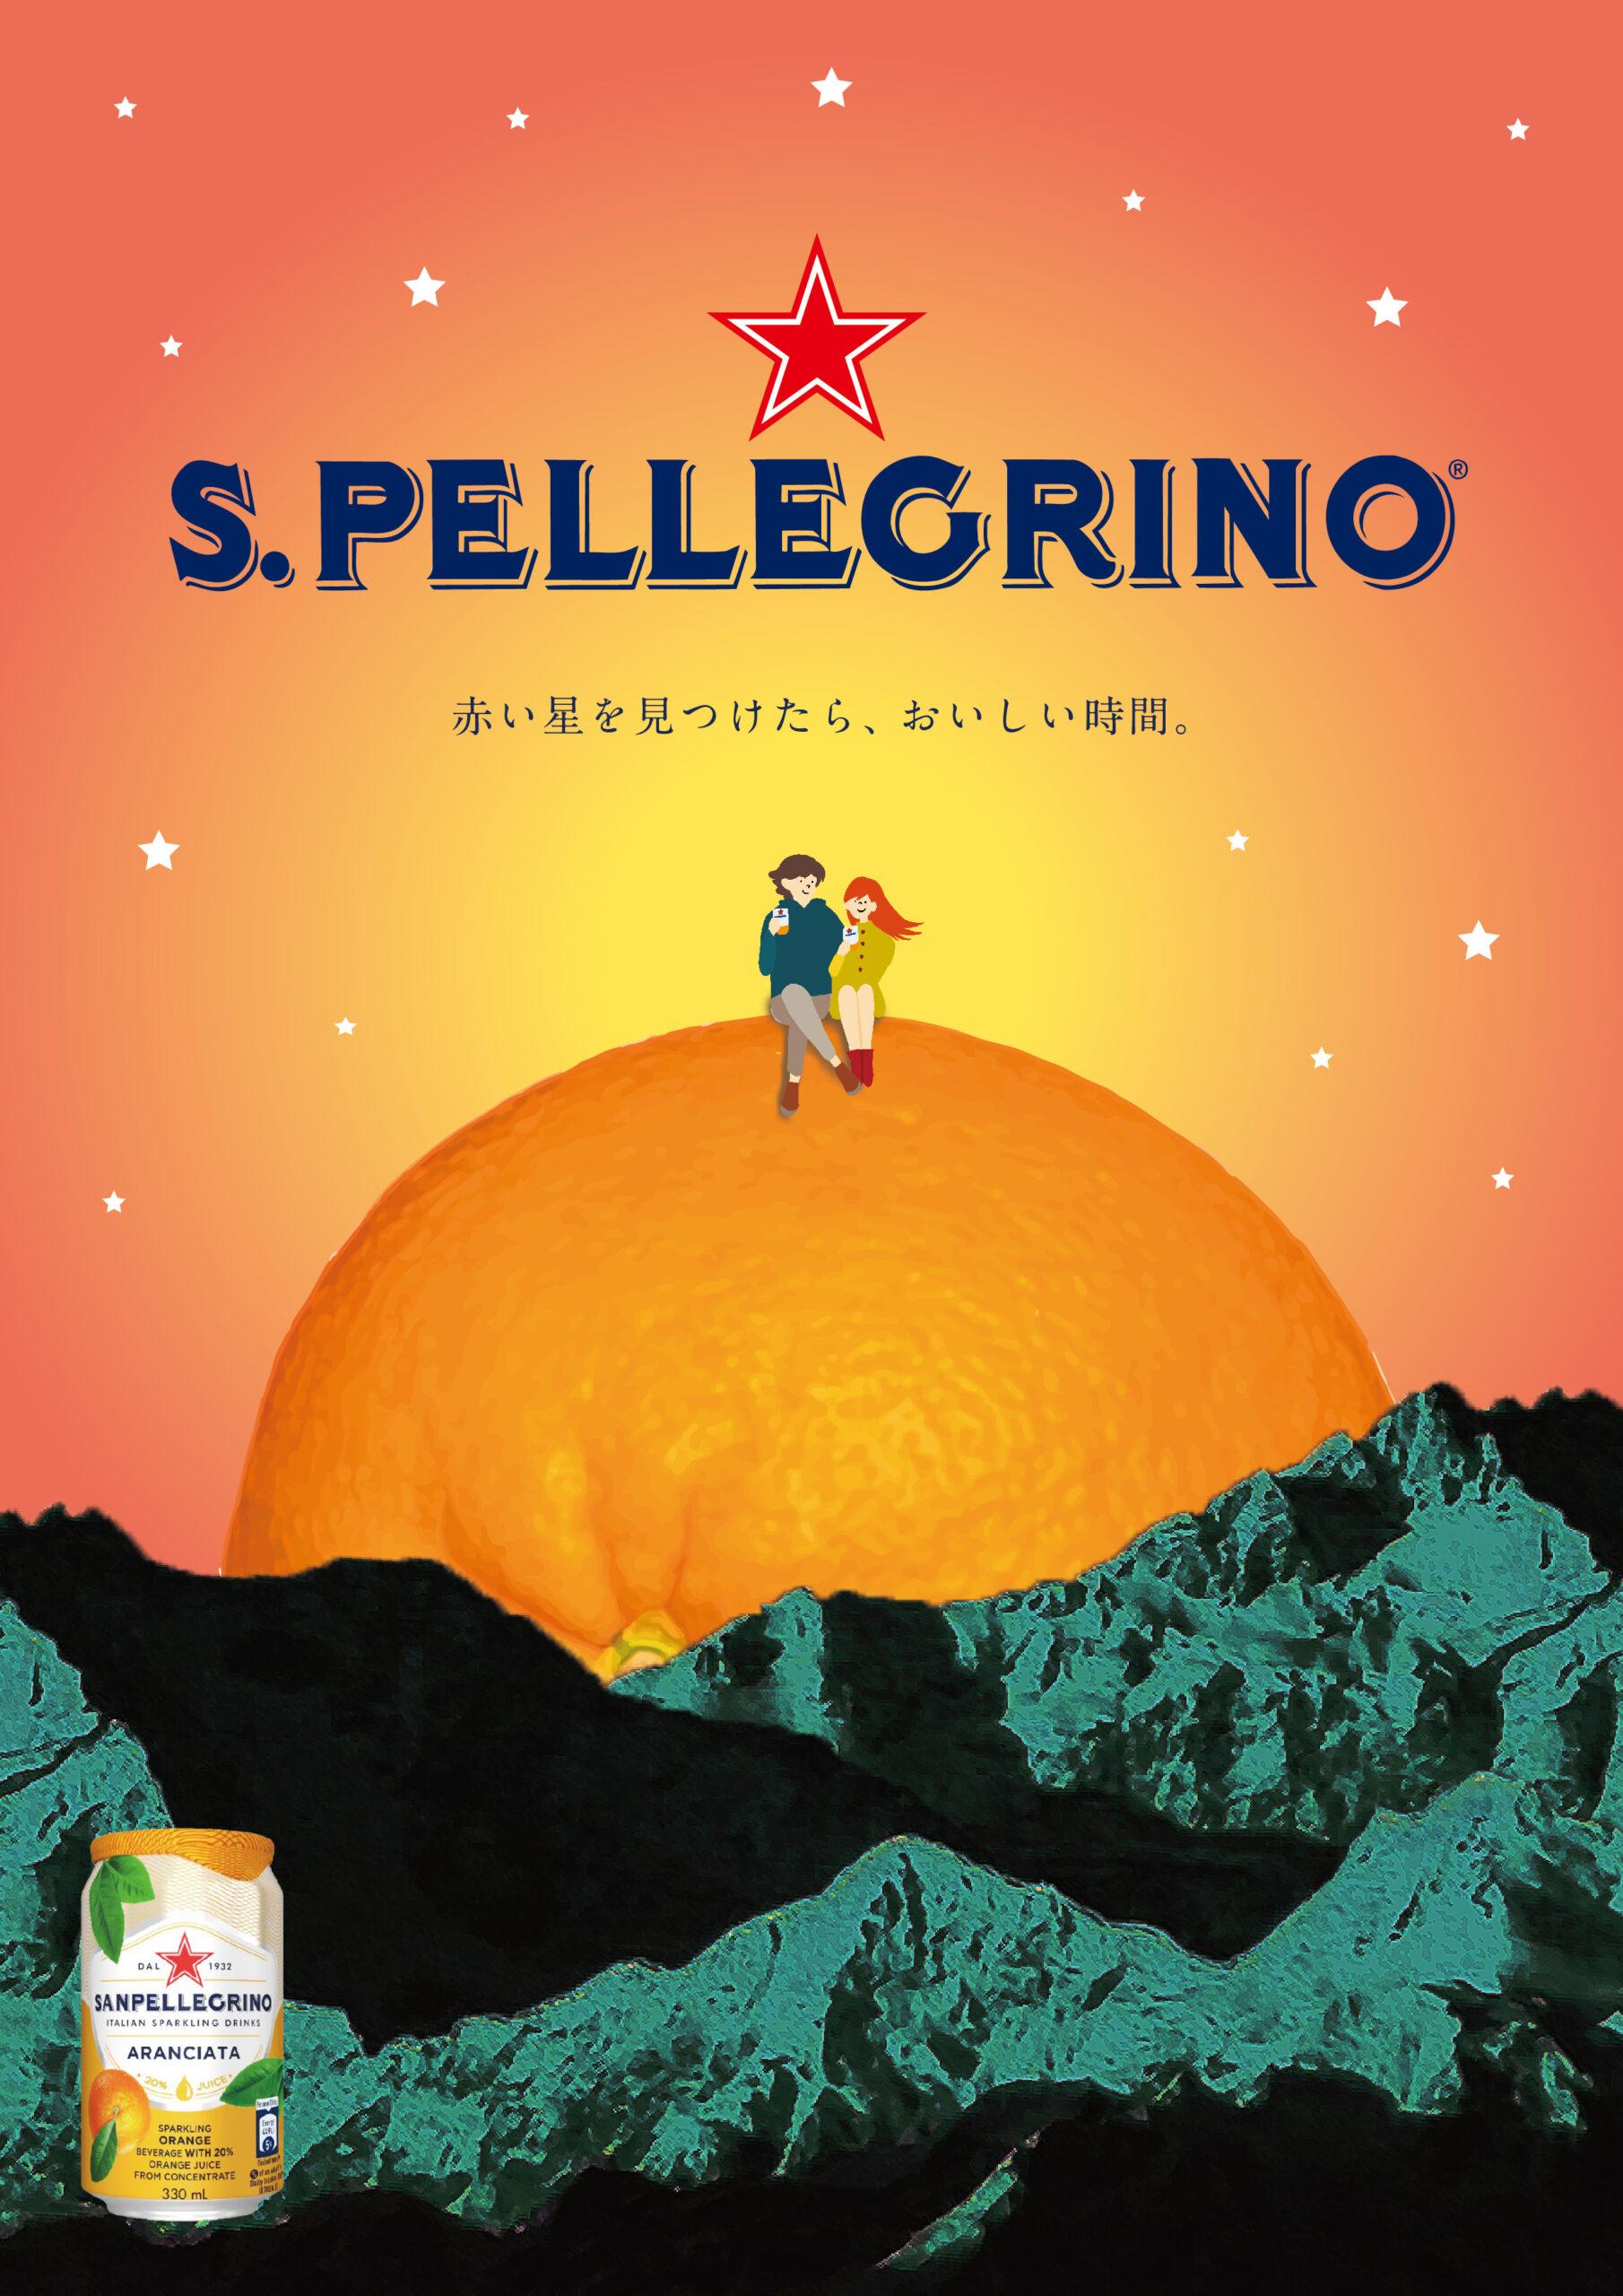 S.Pellegrinoの広告作ってみた(夕焼けカップル編)